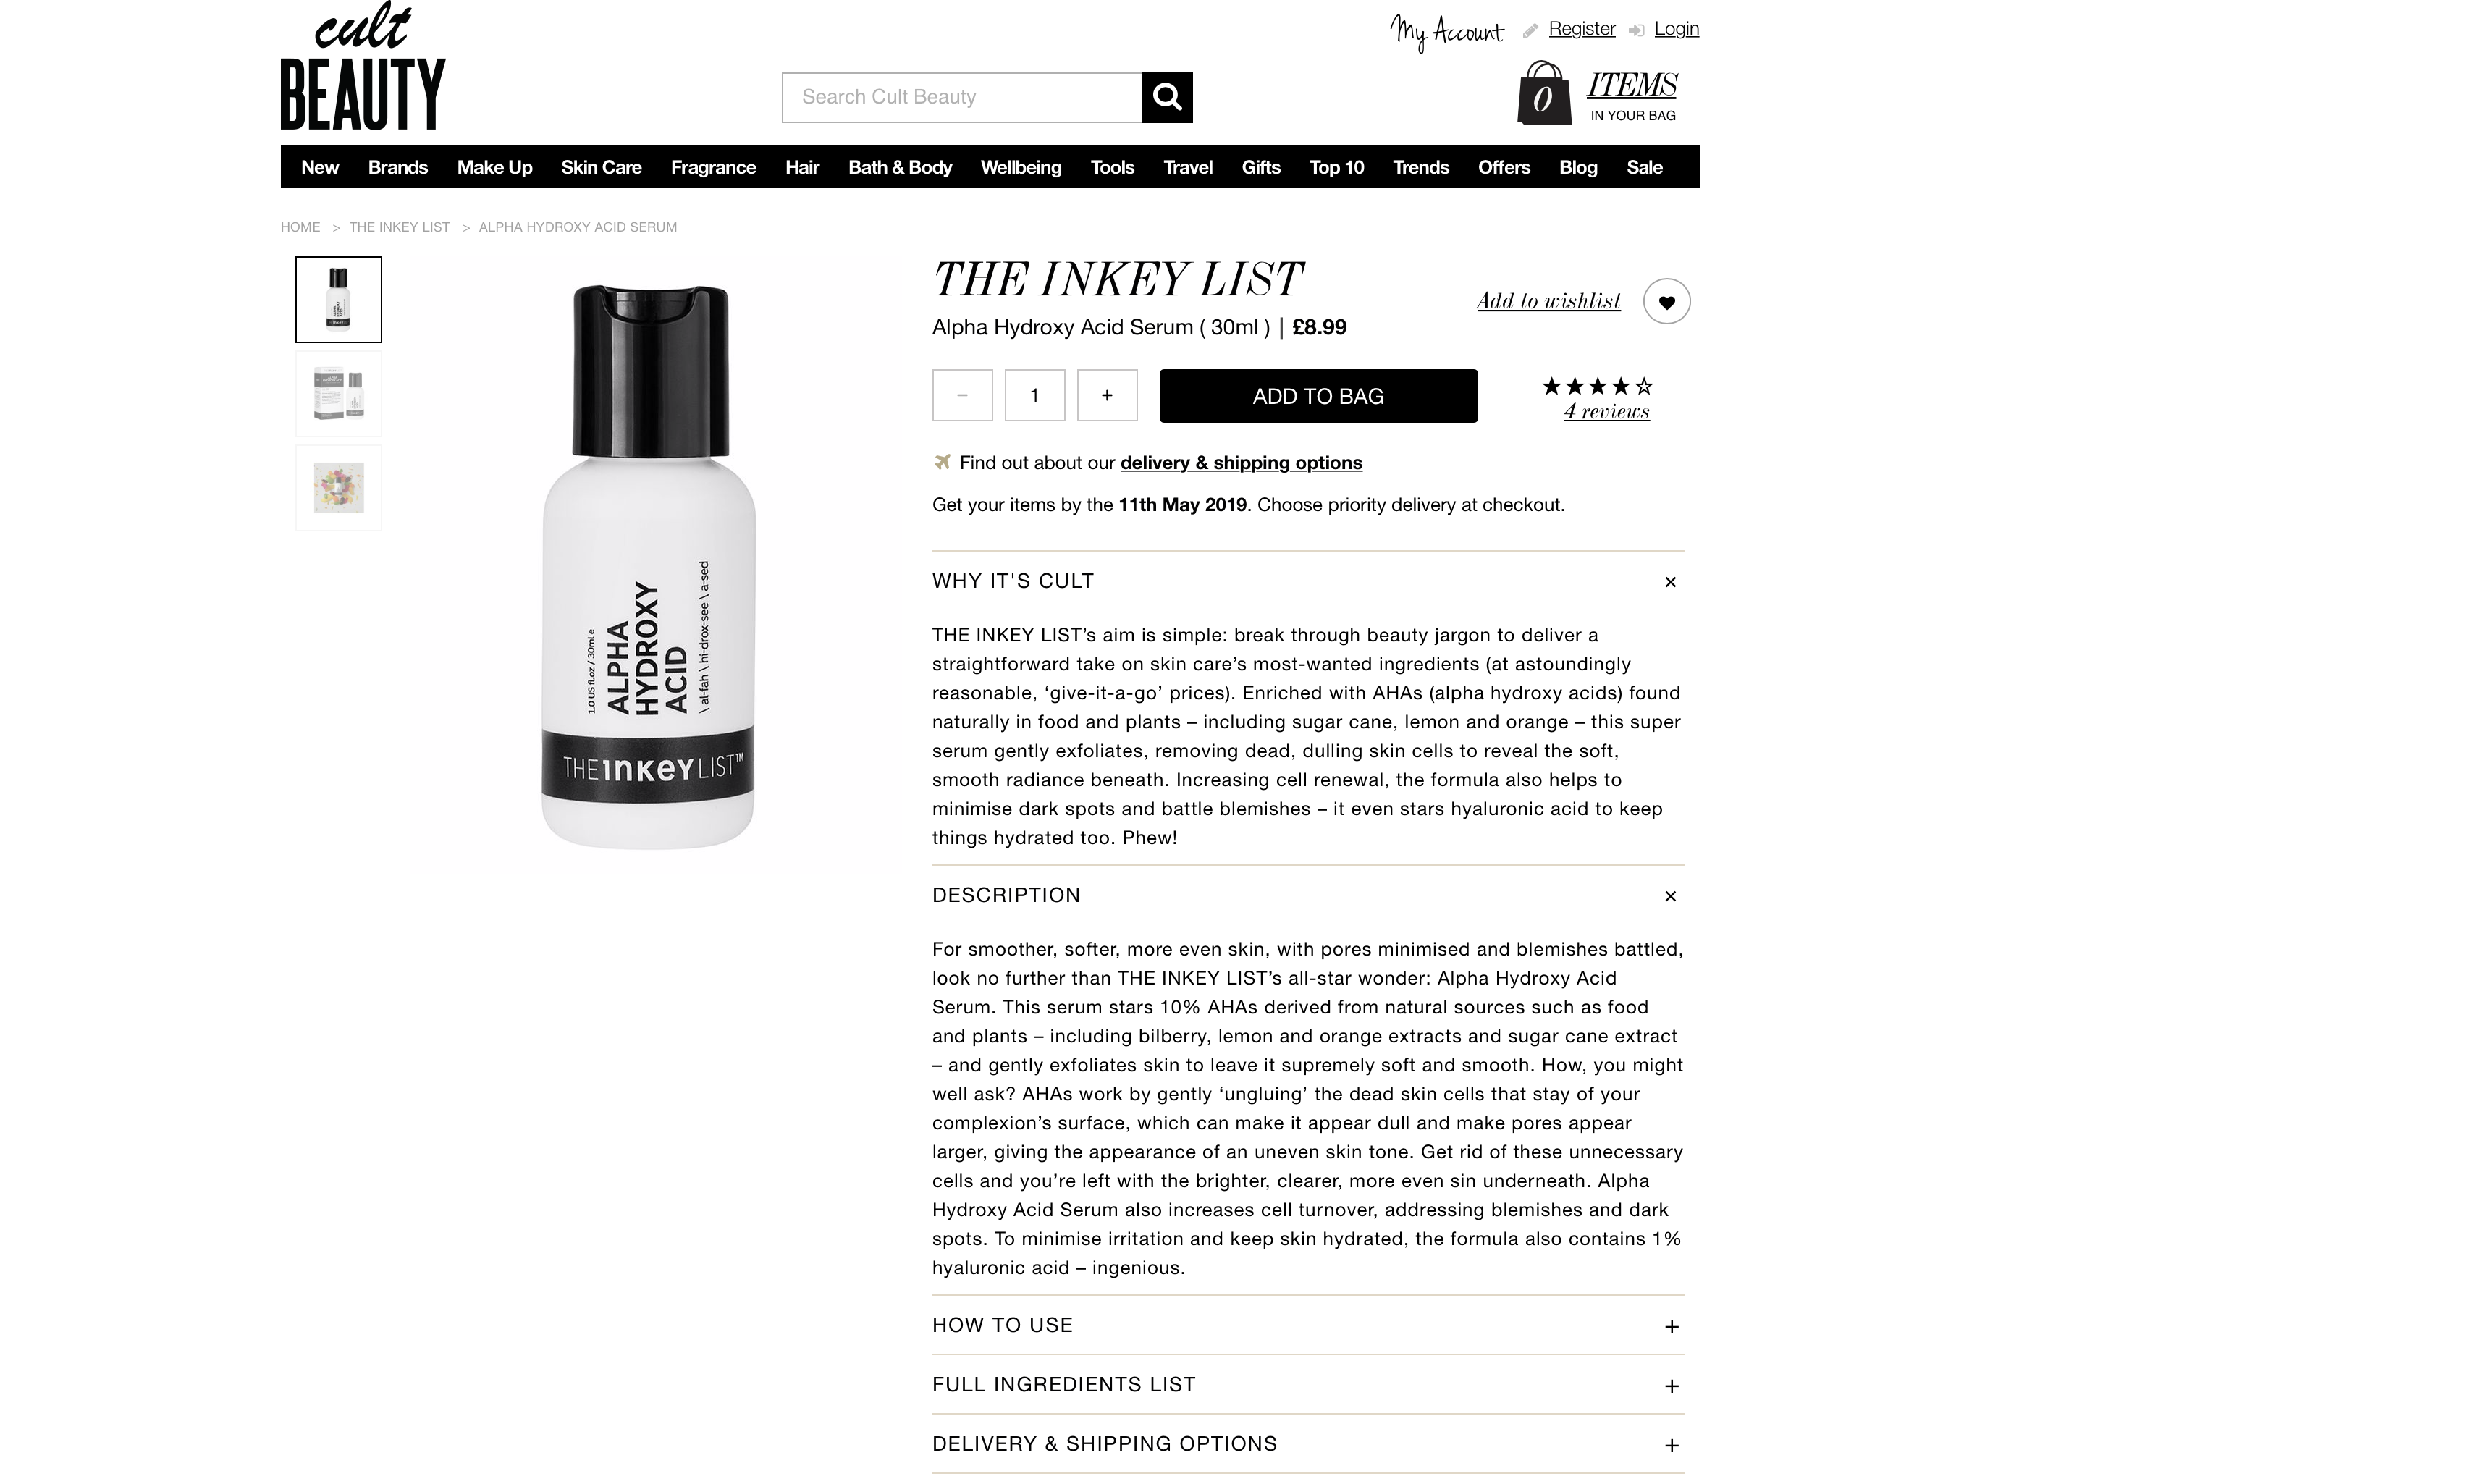 The Inkey List Alpha Hydroxy Acid Serum